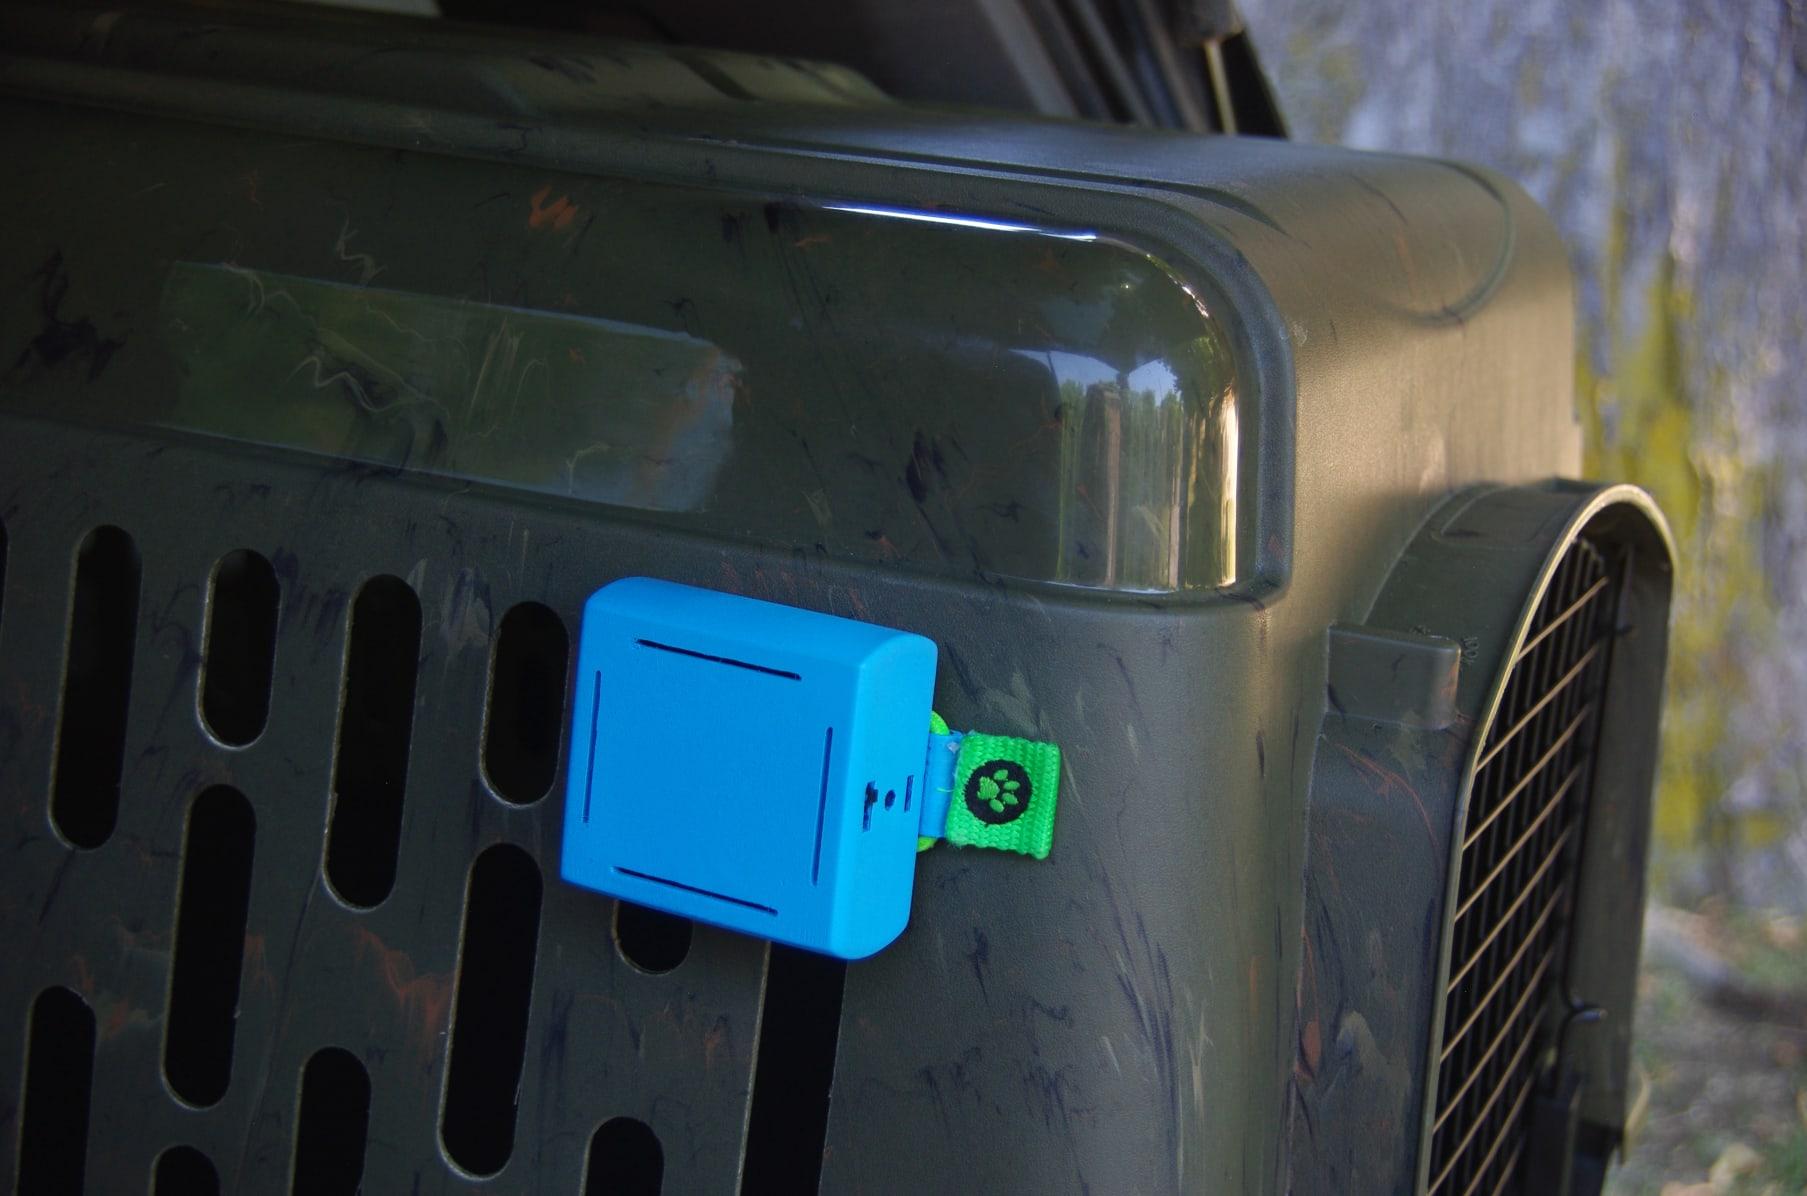 GUARD DOG CAR WARNING NEW WINDOW INSIDE STICKER